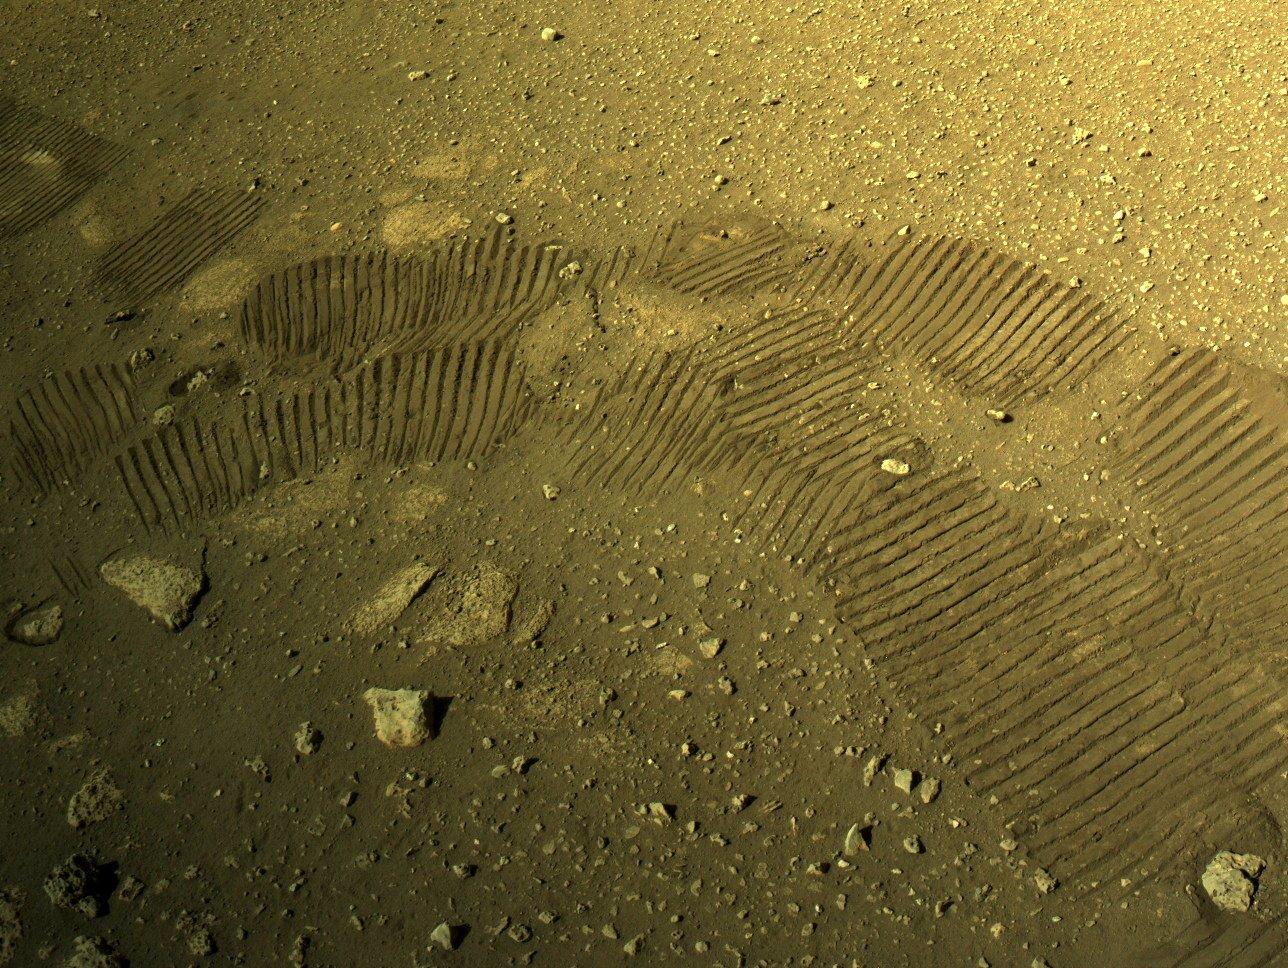 Mars 2020 (Perseverance - Ingenuity) : exploration du cratère Jezero - Page 4 EvtkGefWYAARRQH?format=jpg&name=large